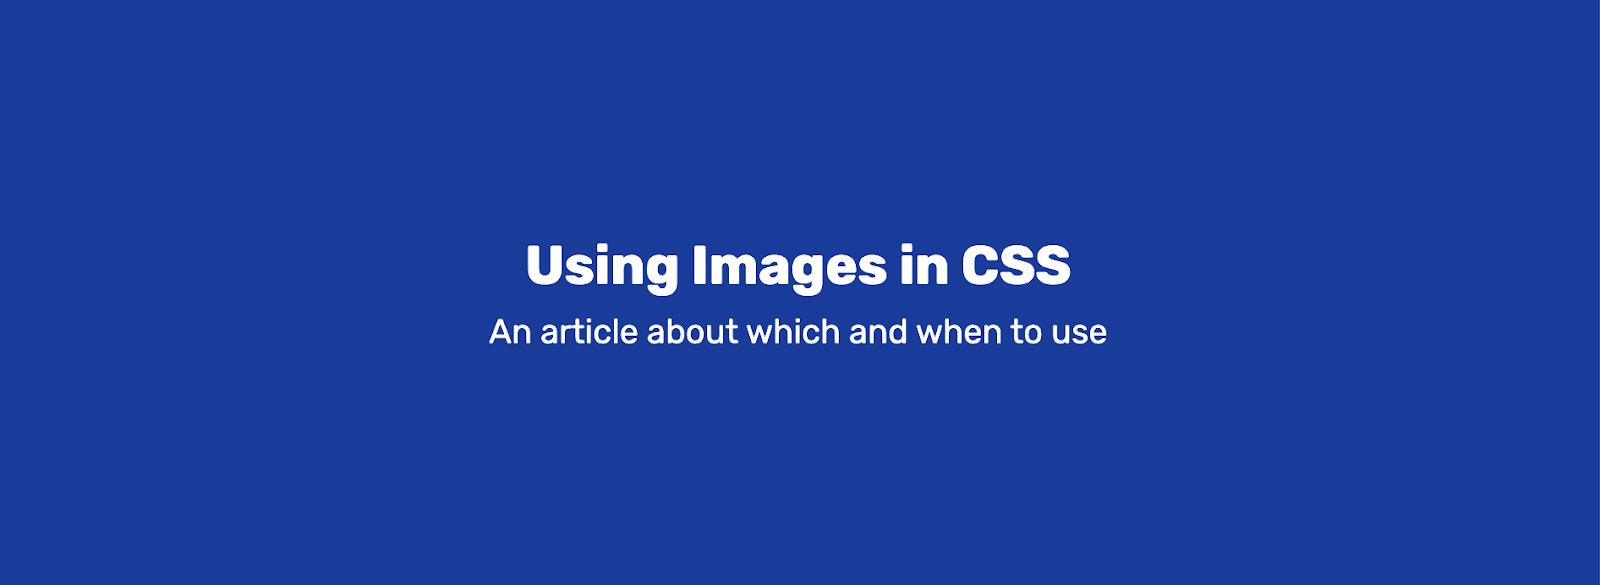 [в закладки] Работа с изображениями в веб - 11